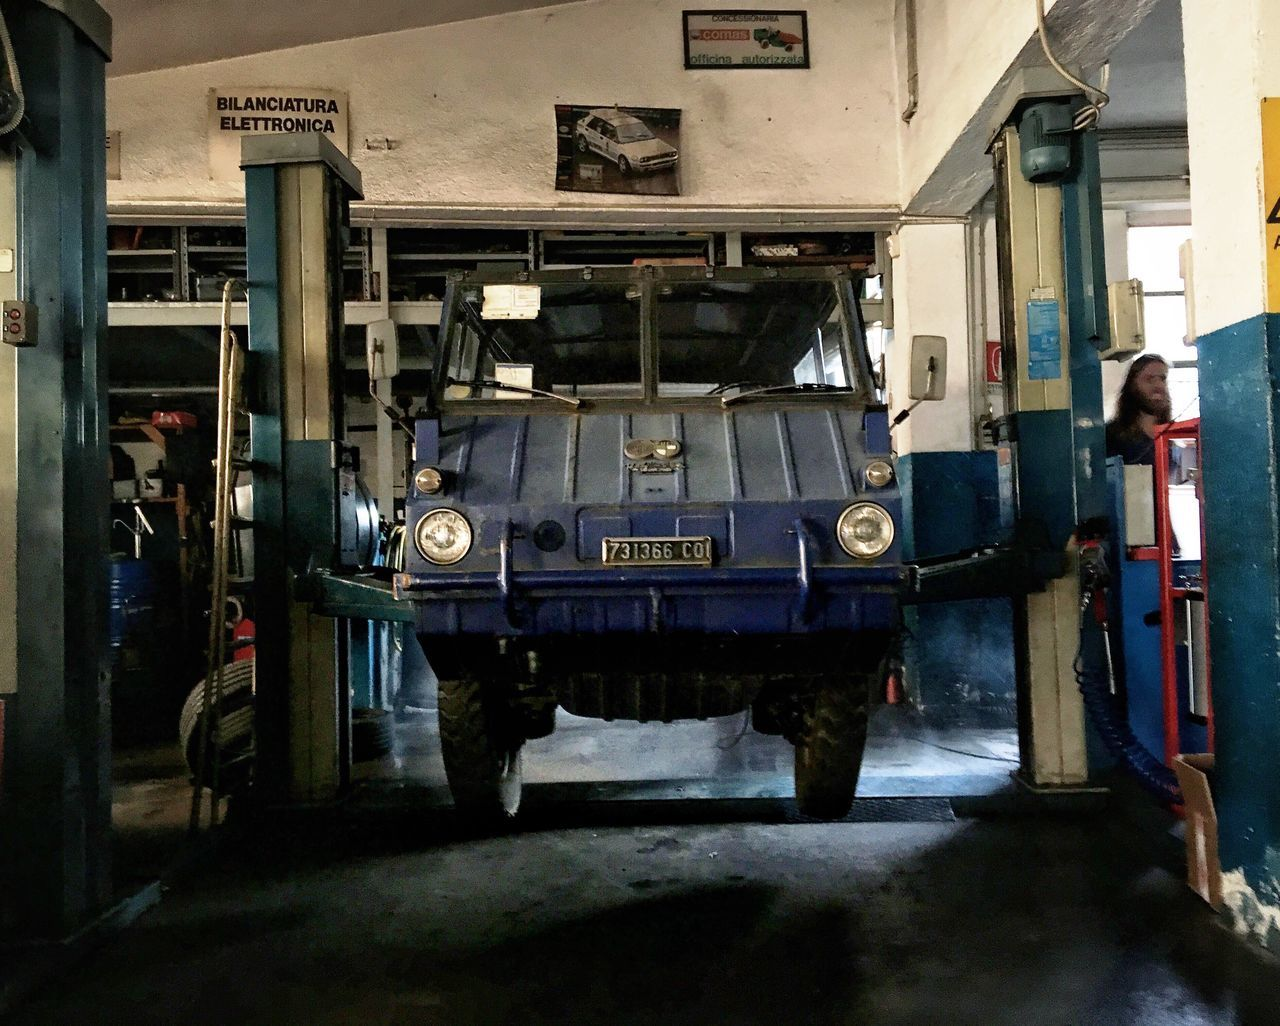 Puck Torno, Como Lago Italy Happytime Car Mechanic 4x4 Offroad David De La Cruz Delacruzfotografia